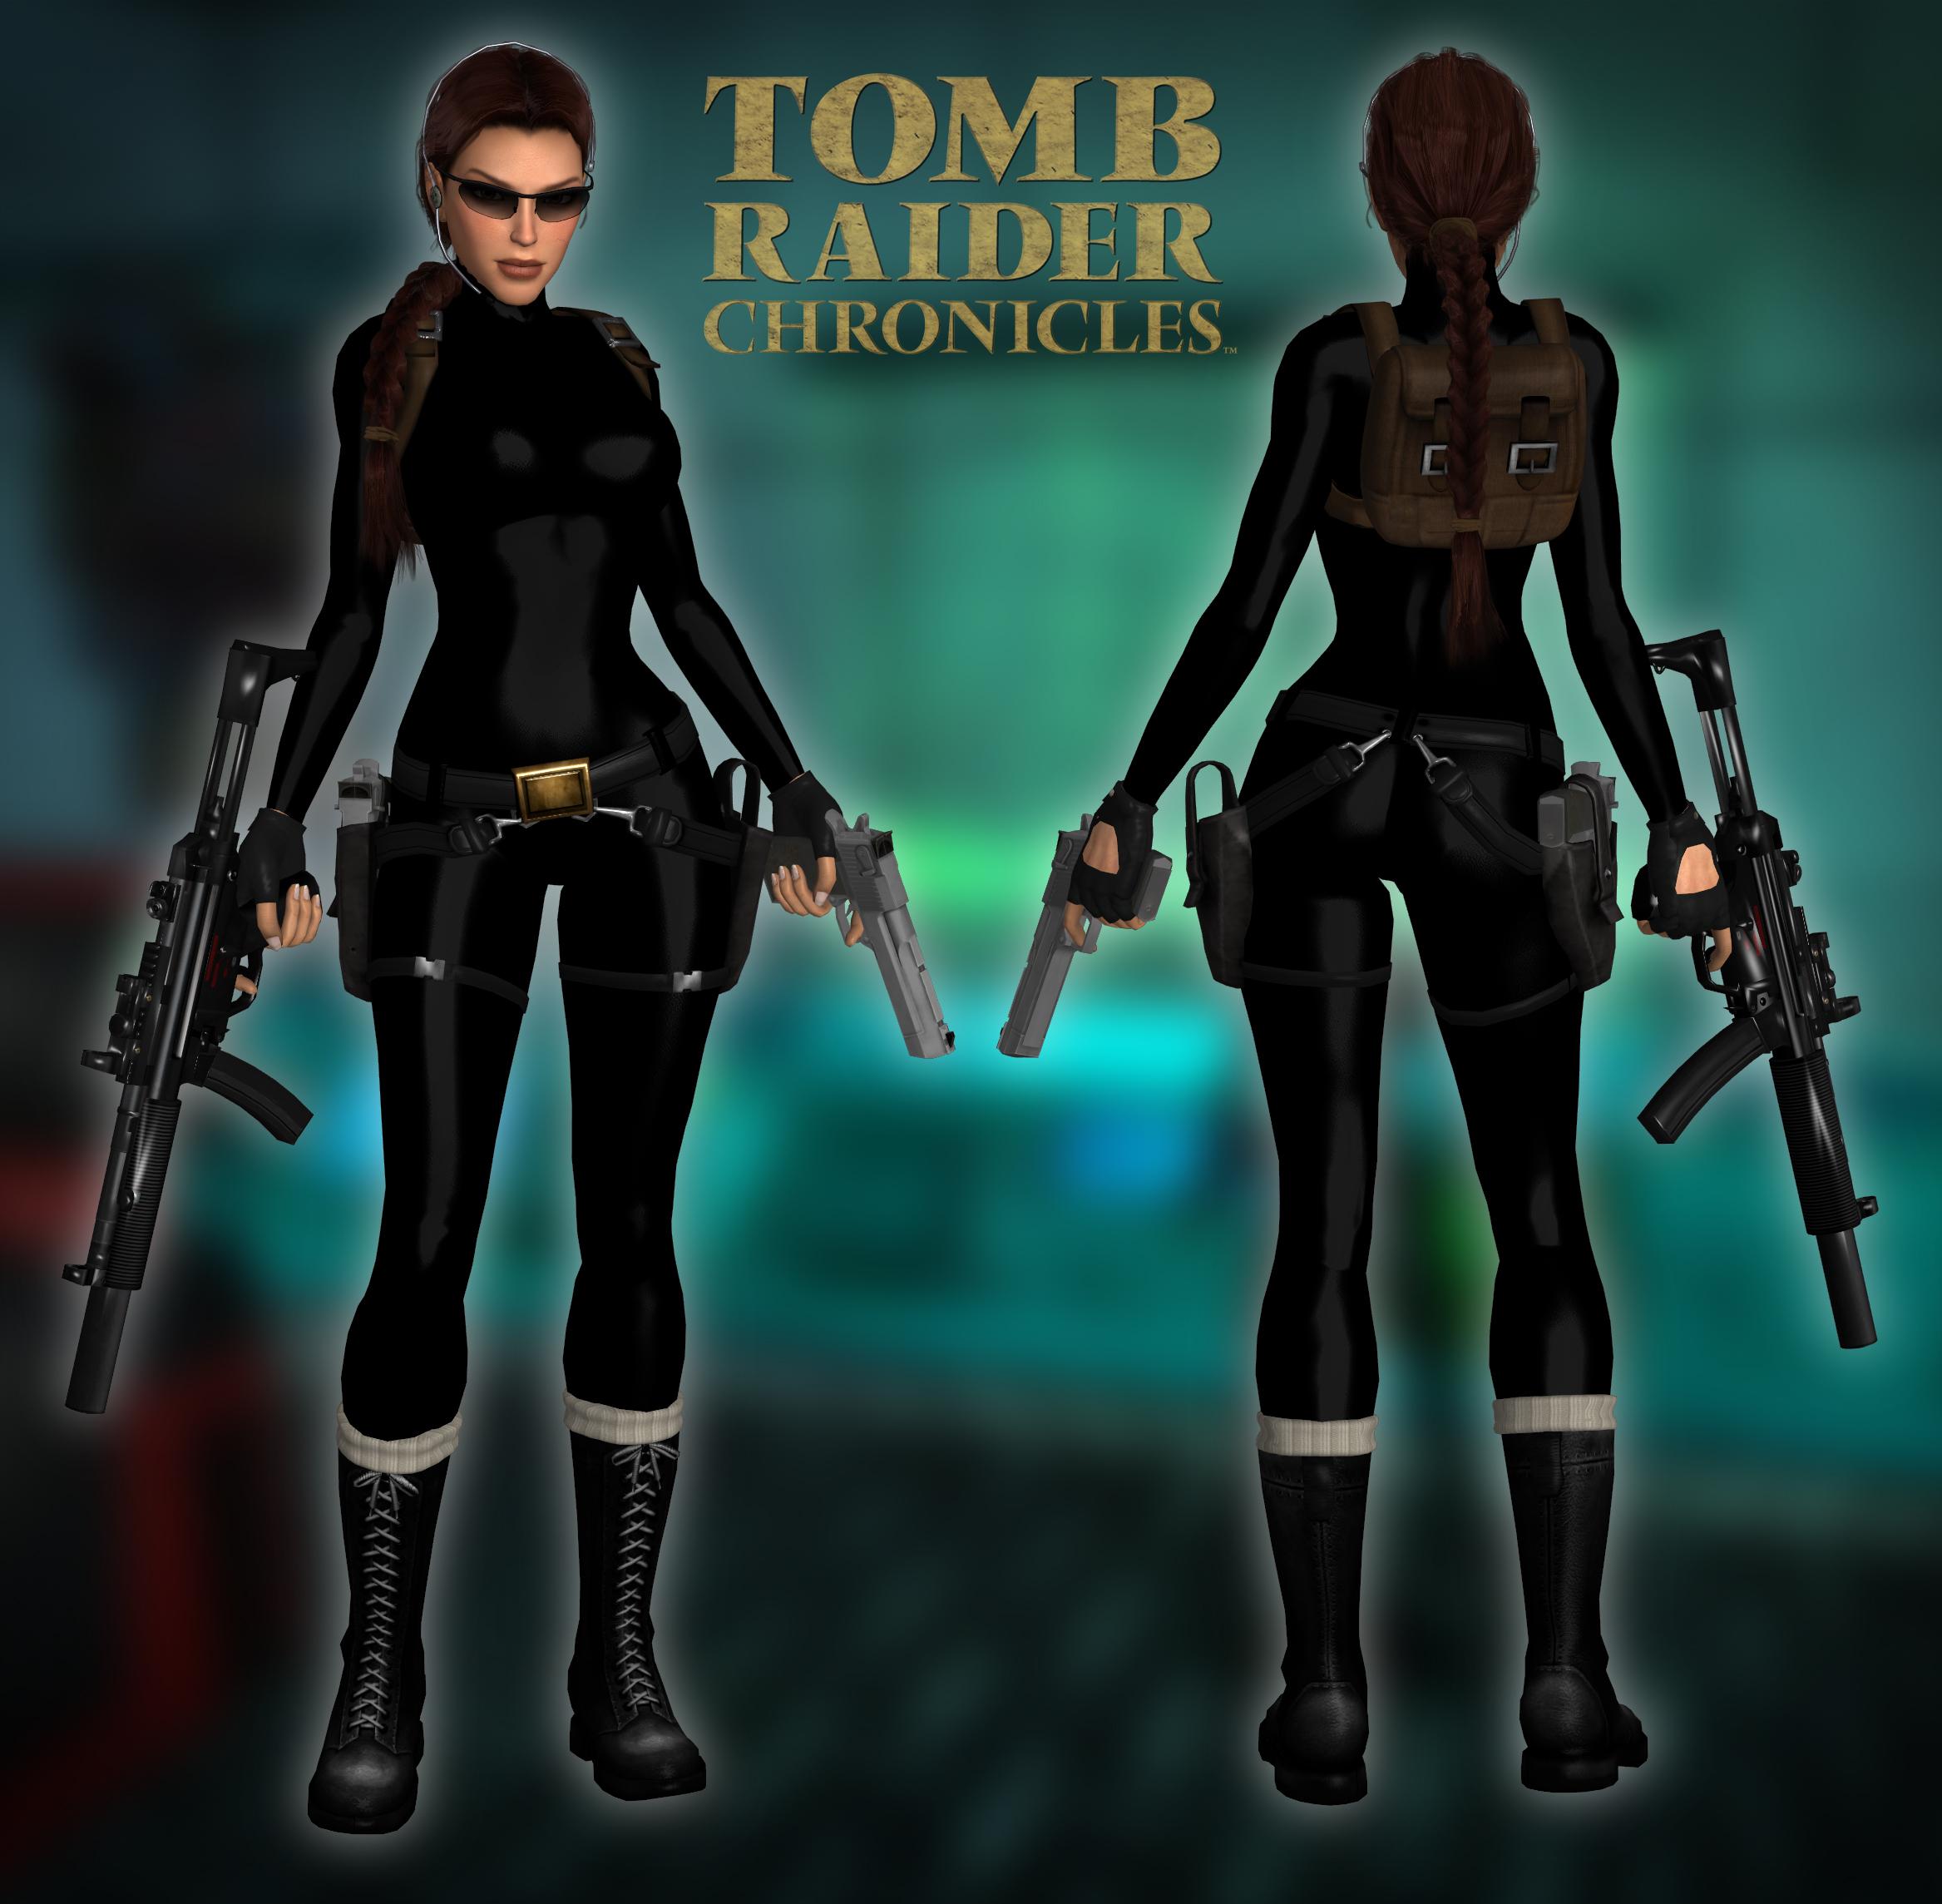 3d Tomb Raider Wallpaper: Catsuit By Larreks On DeviantArt